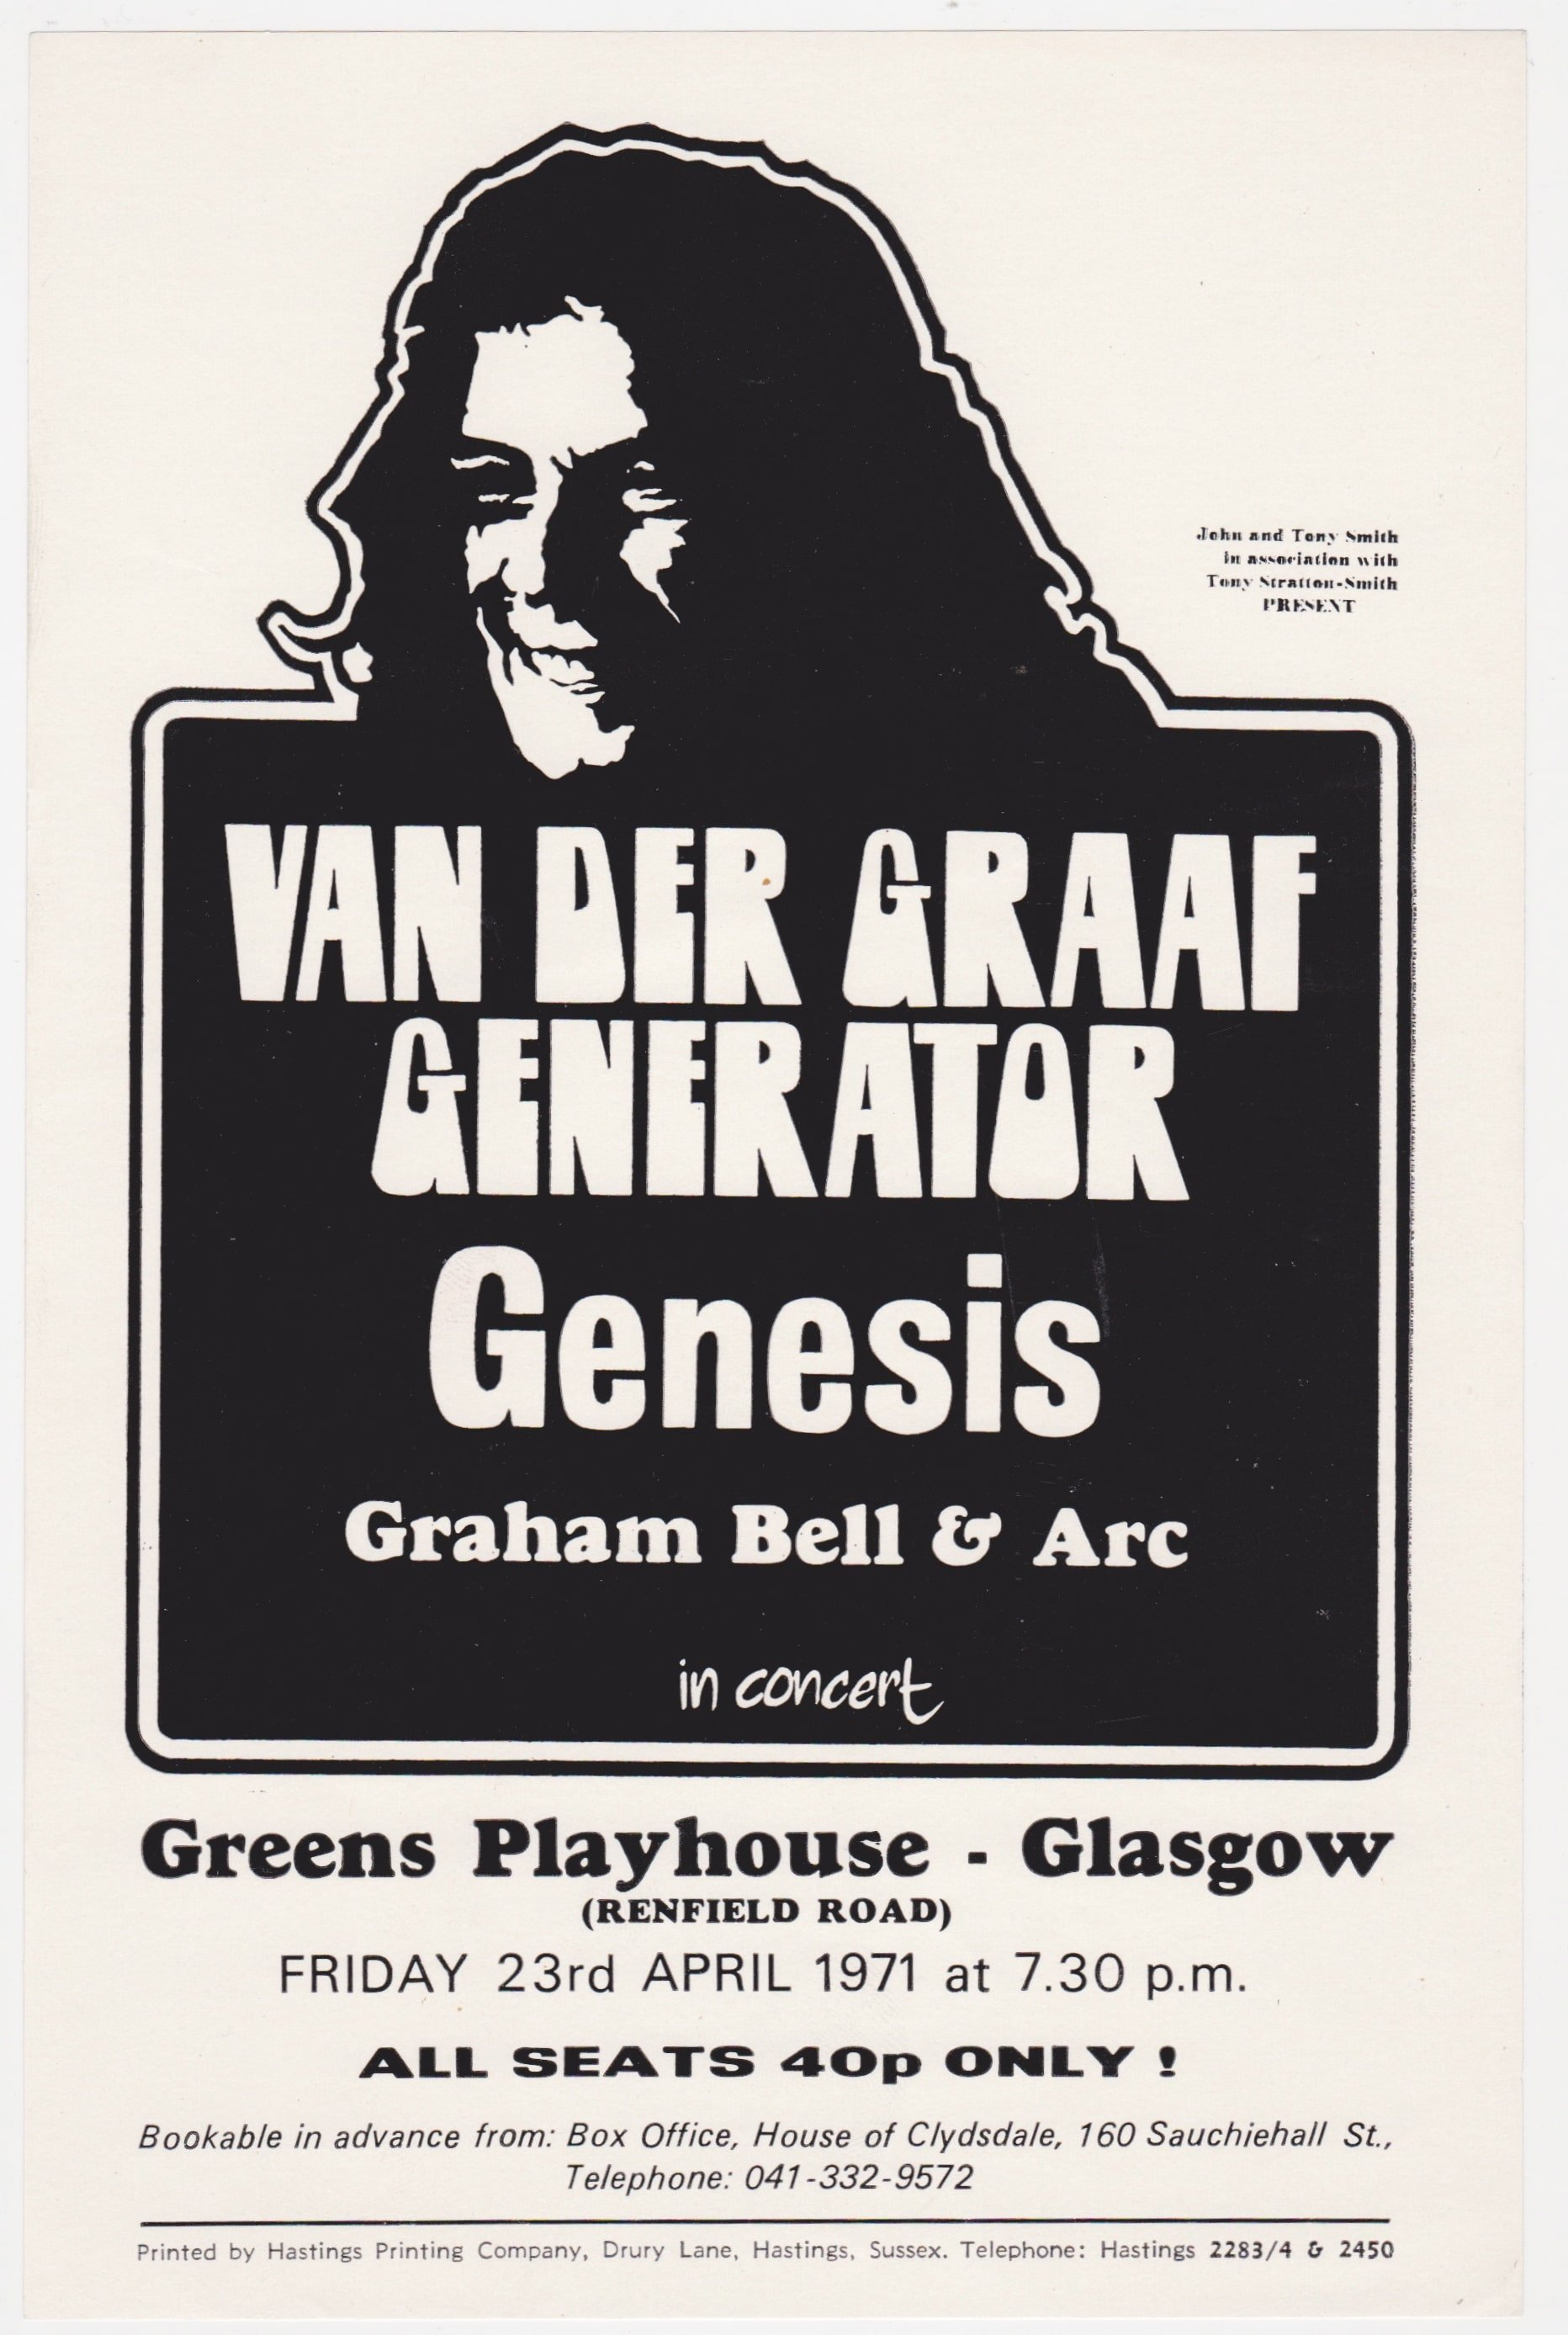 Genesis & Van Der Graaf Generator – Charisma Package Tour 1971Handbill